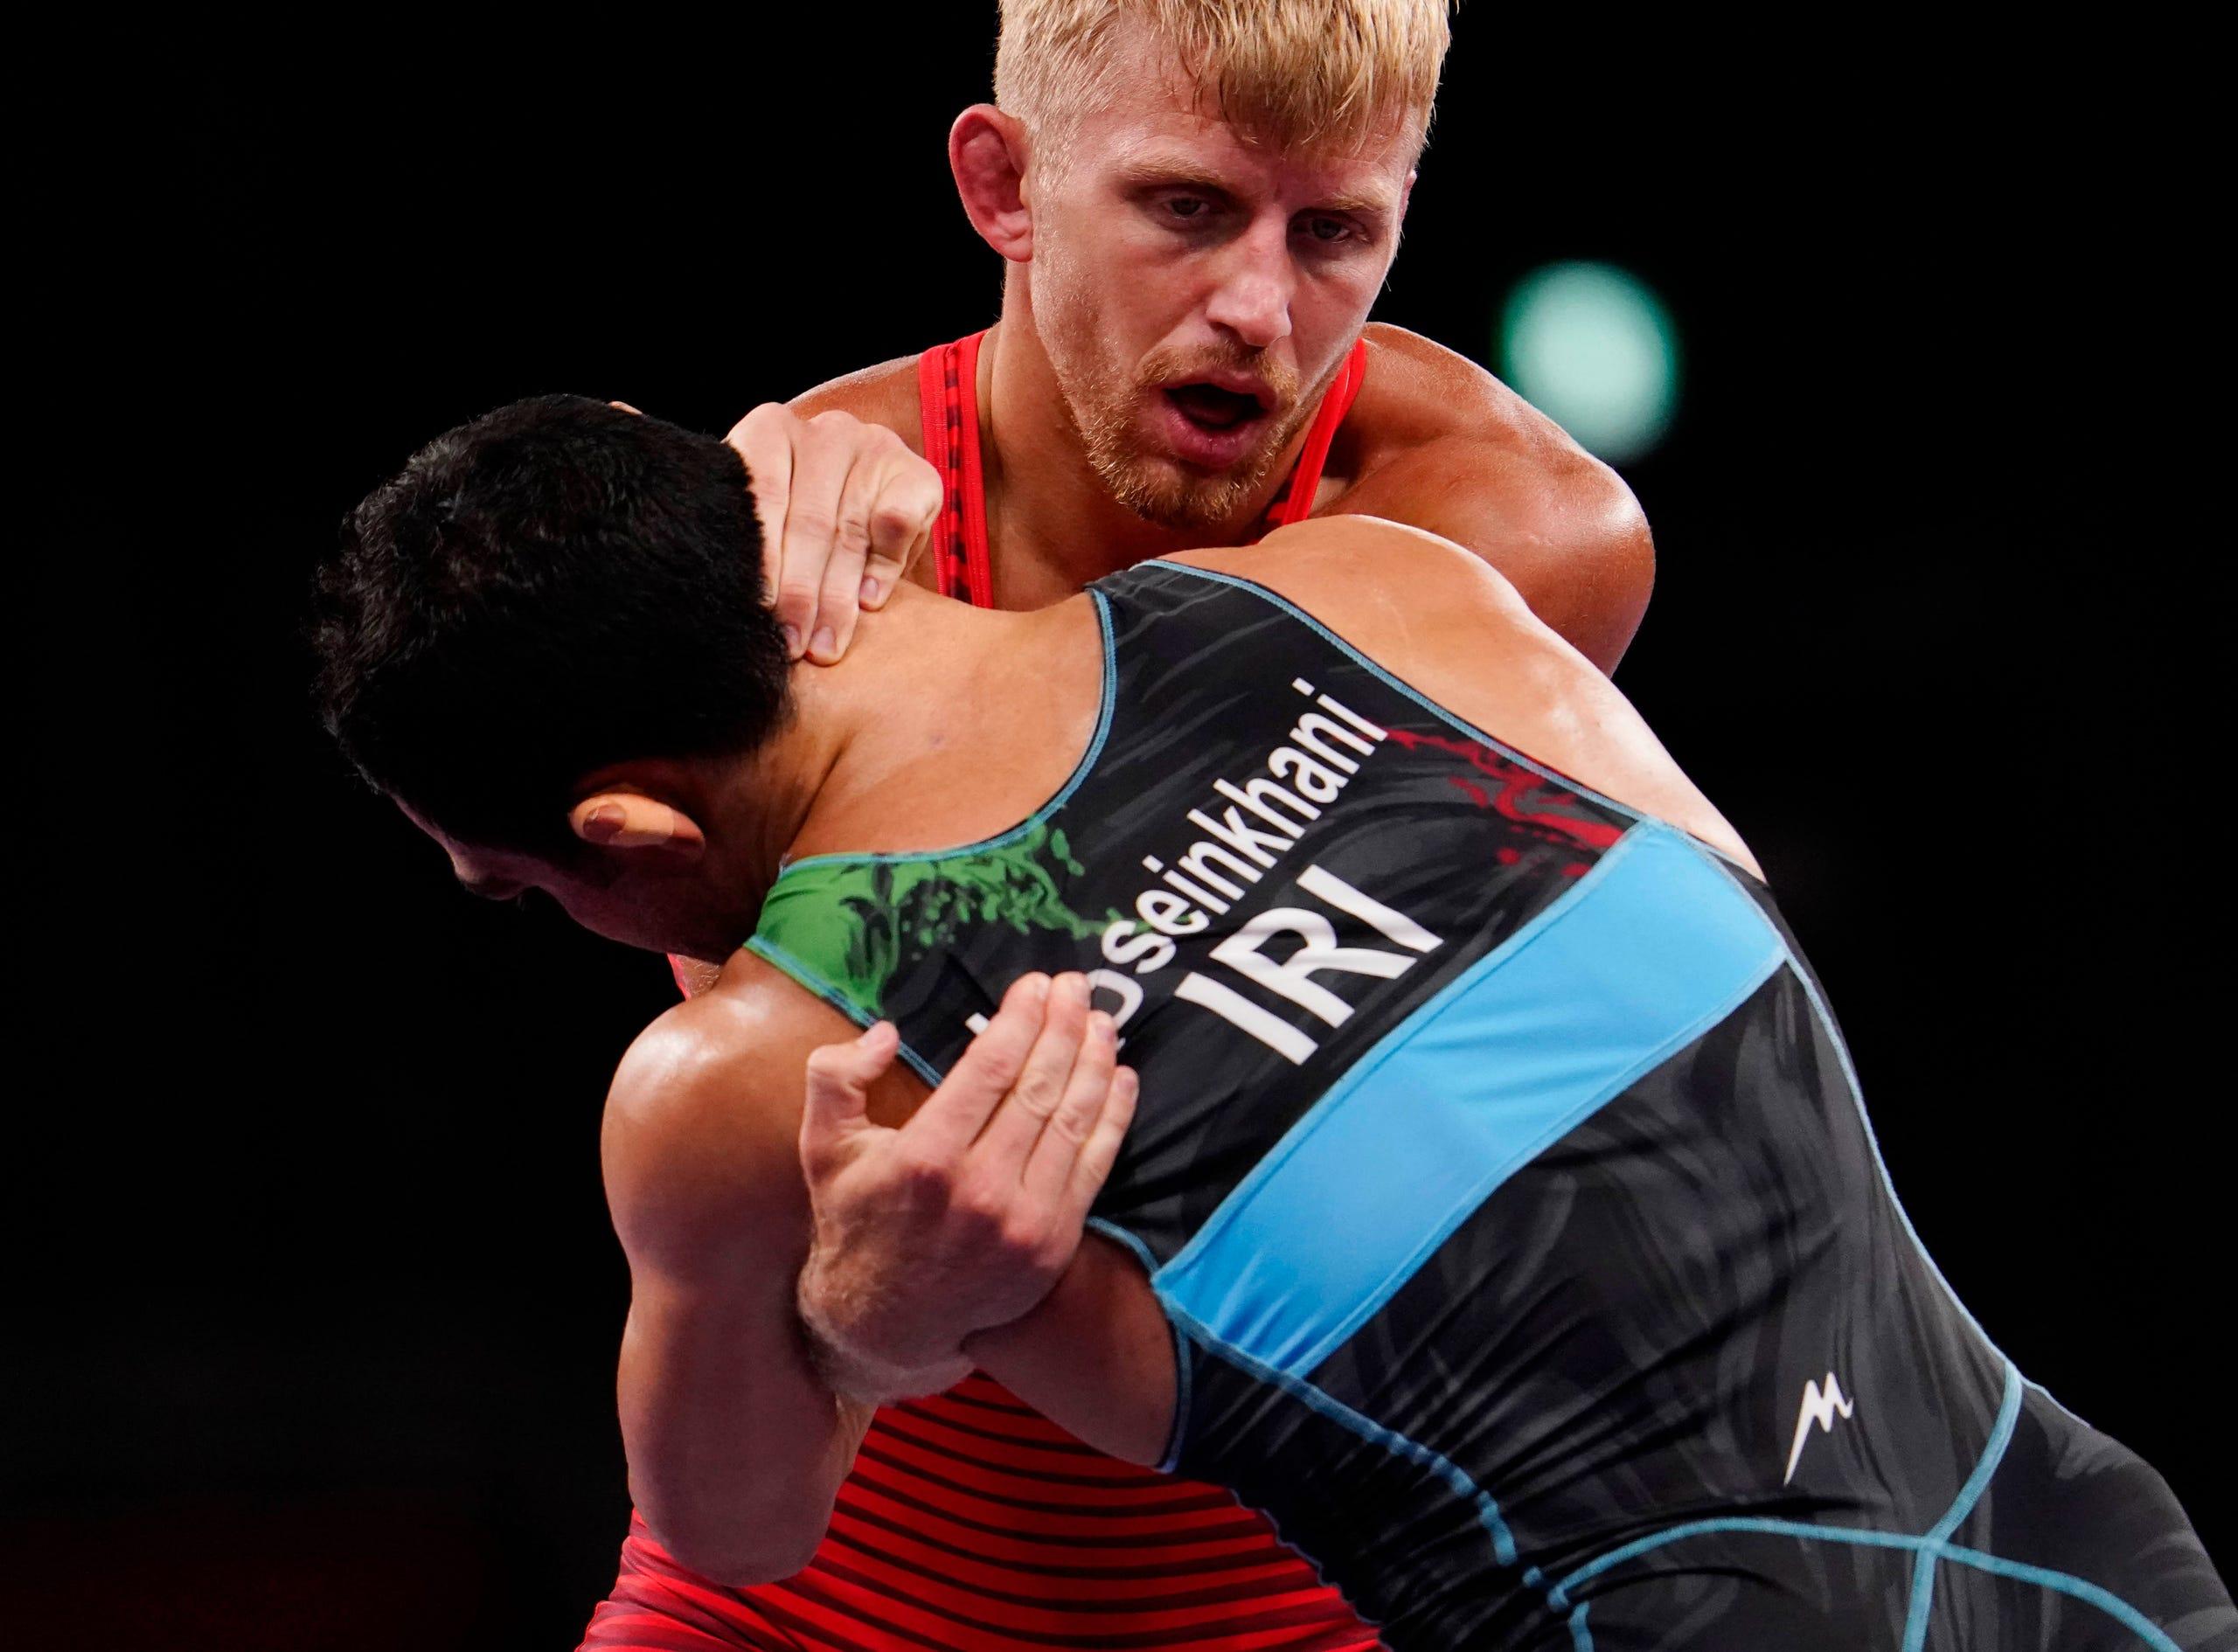 Photo gallery: Kyle Dake competes at Tokyo Olympics